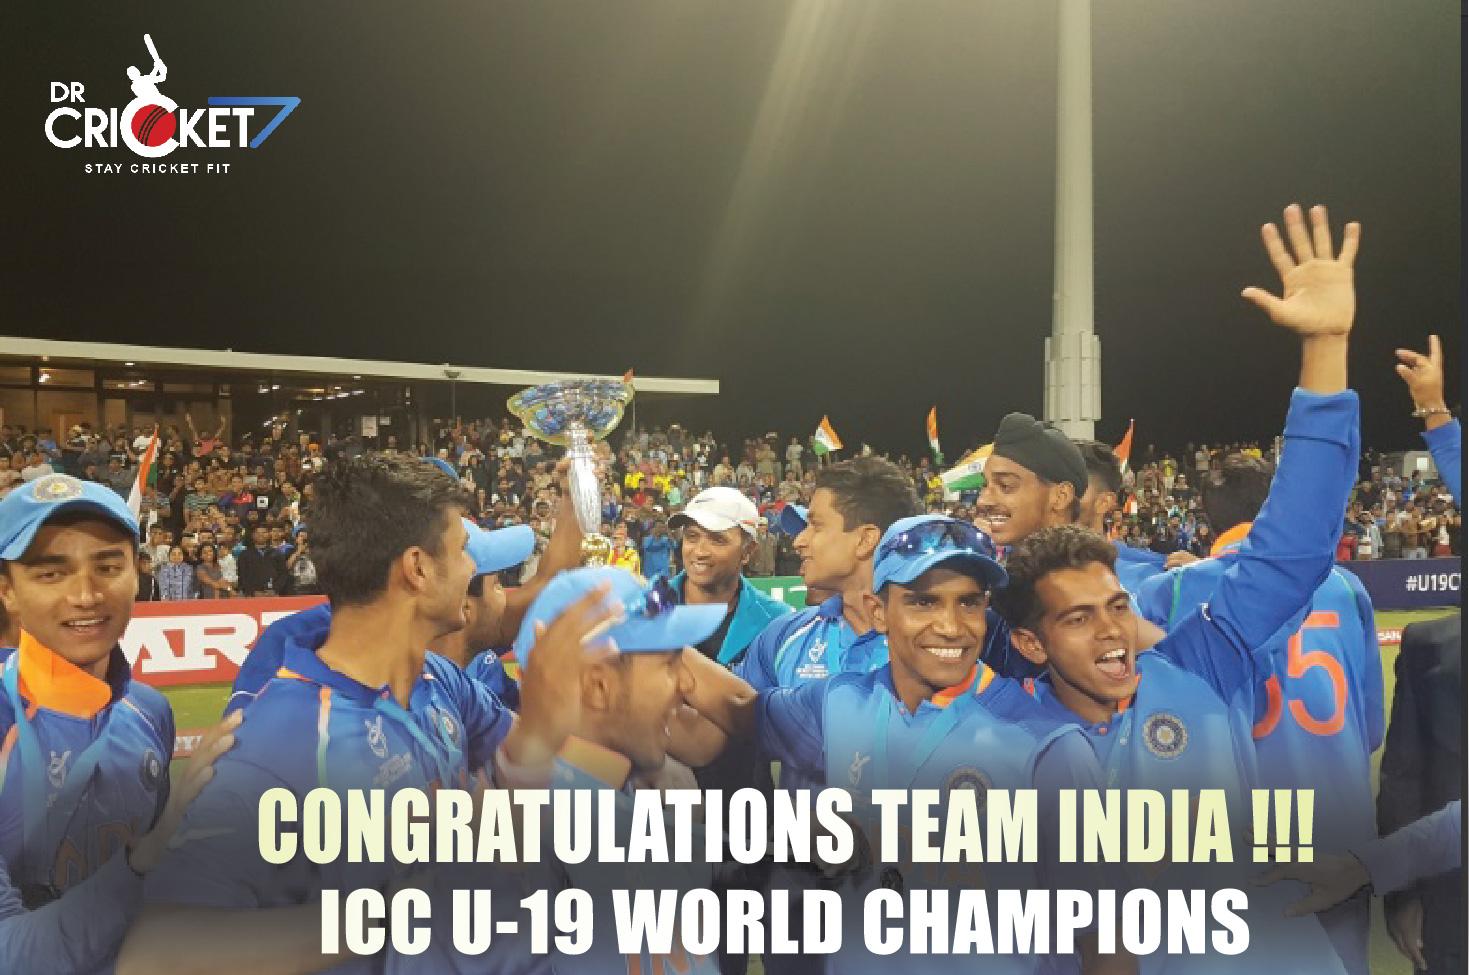 BCCI announces cash reward, Congratulates victorious India U-19 team